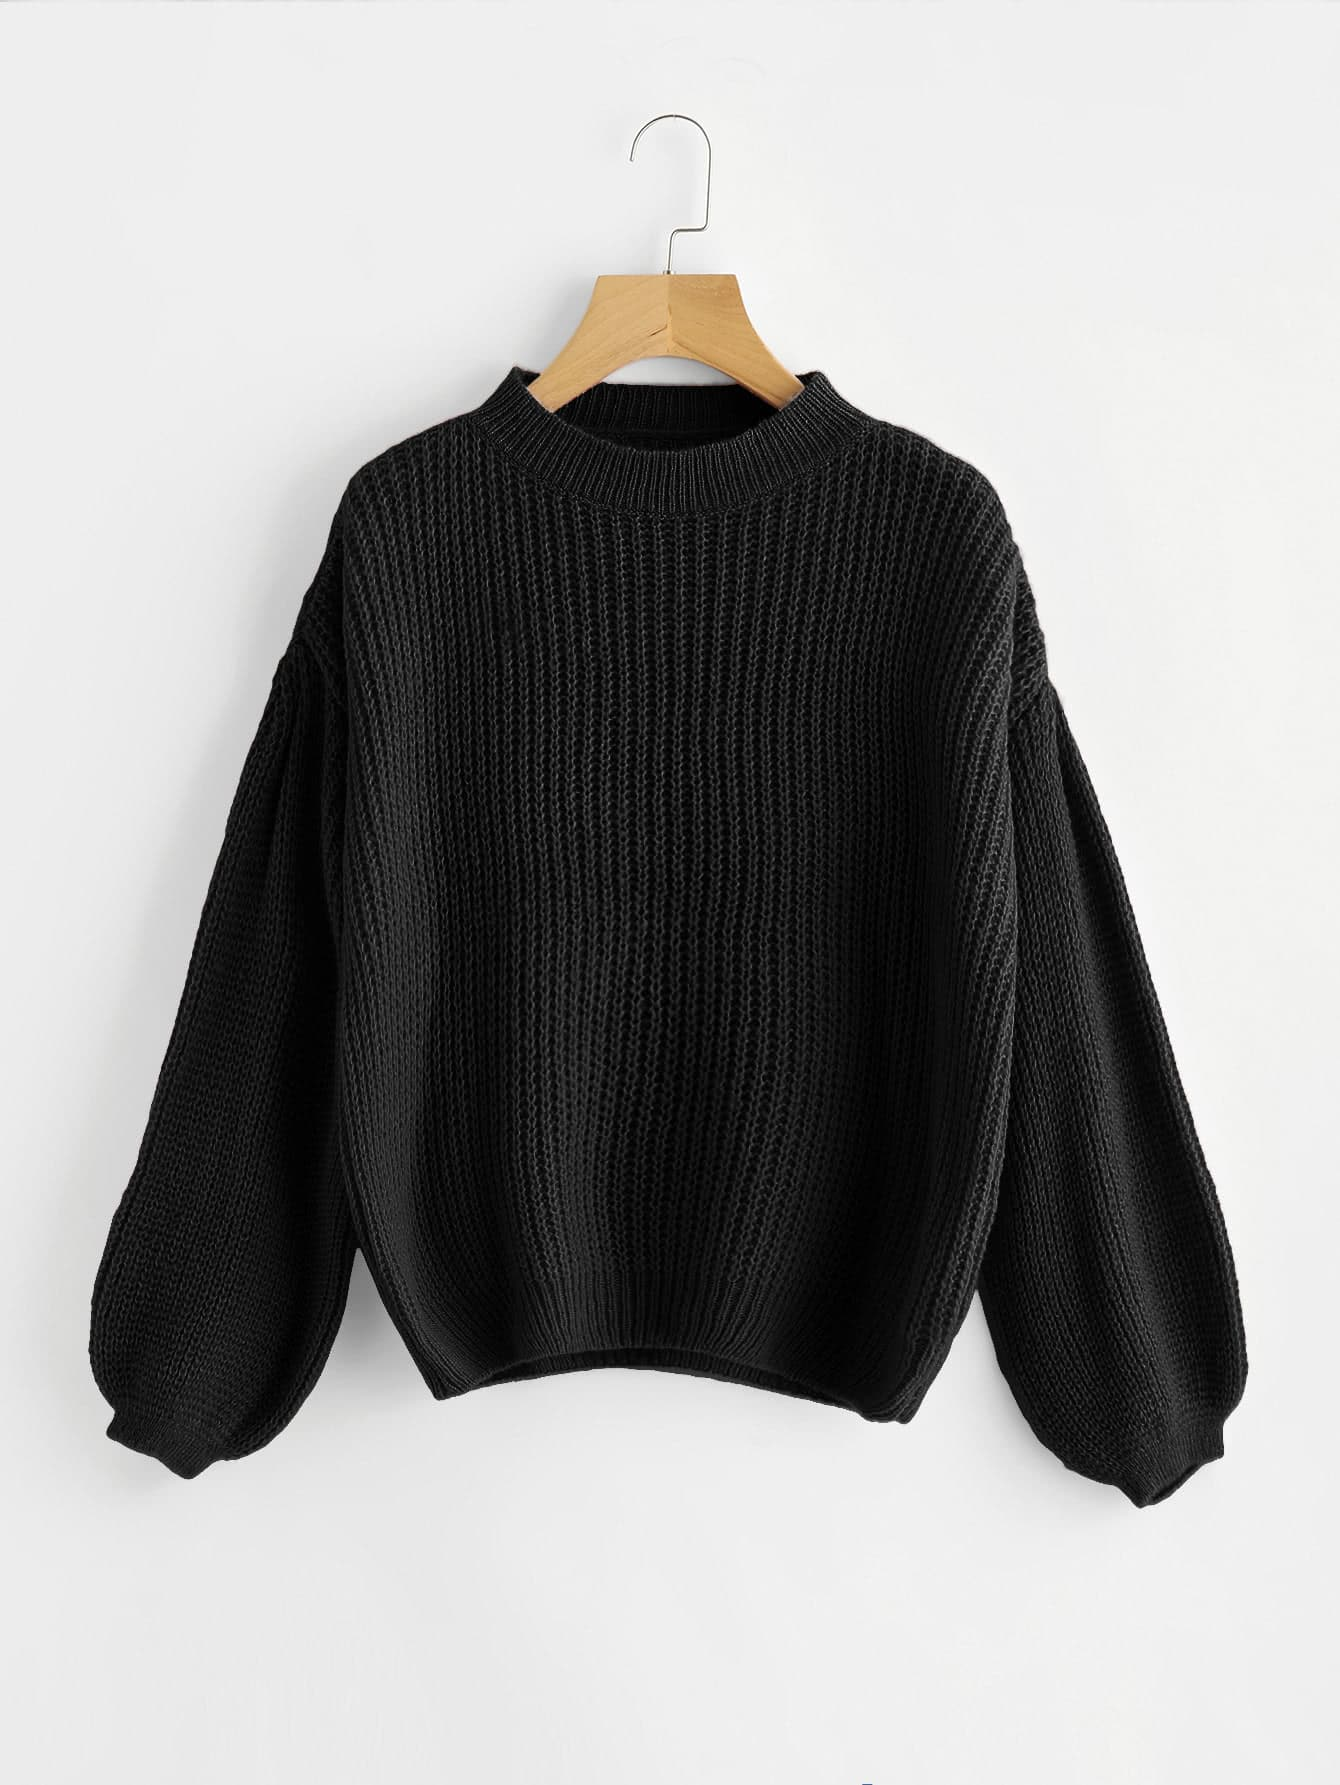 Drop Shoulder Lantern Sleeve Sweater sweater170913451